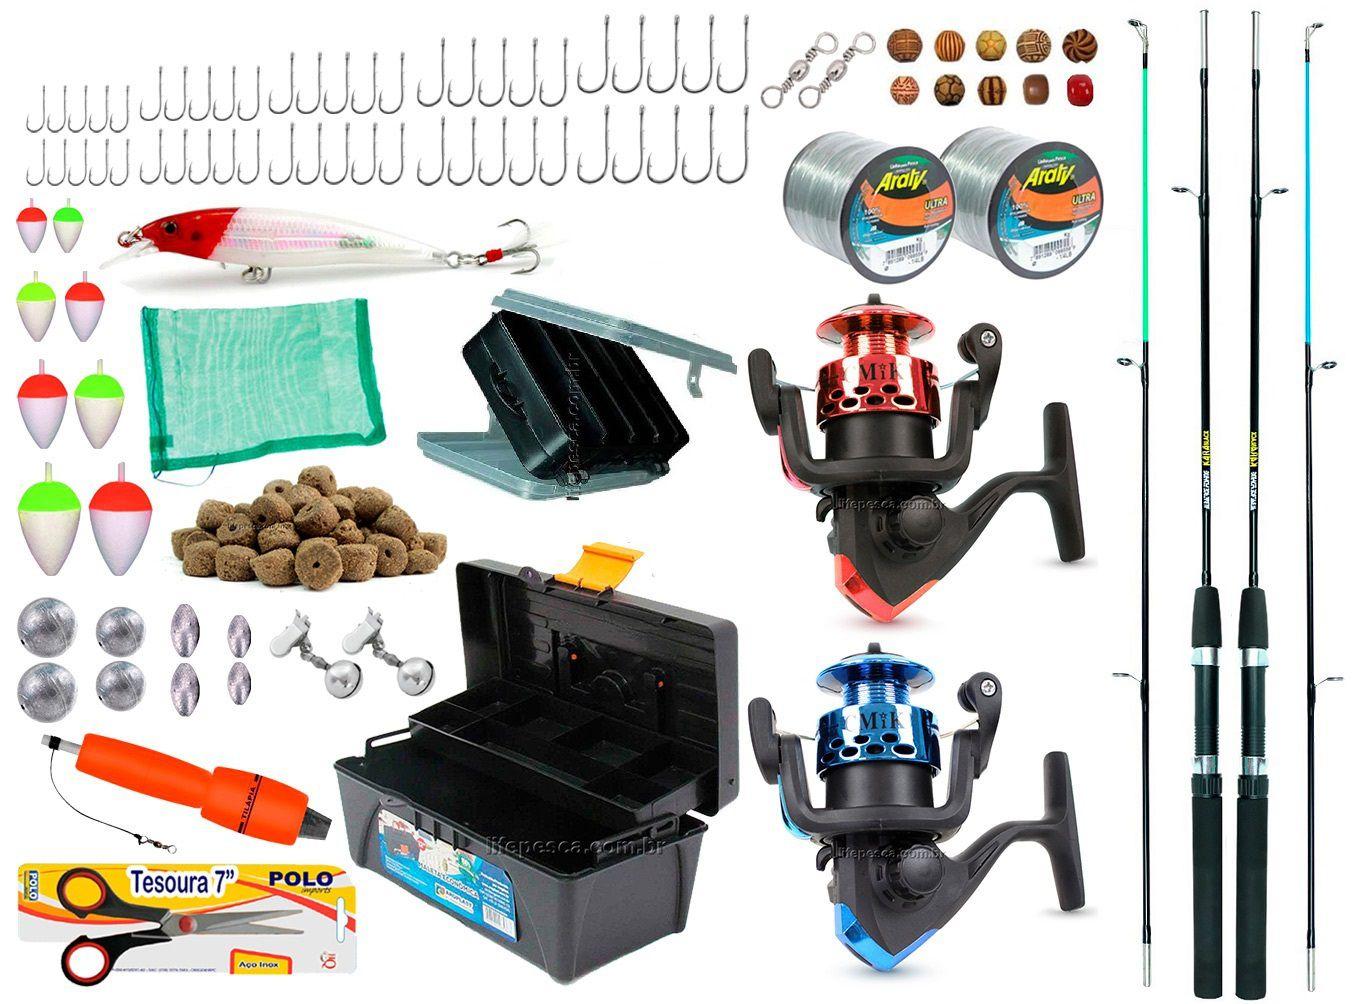 Kit De Pesca Completo 2 Varas 2 Molinetes Caixa de Pesca + Acessórios (Ref. 04)